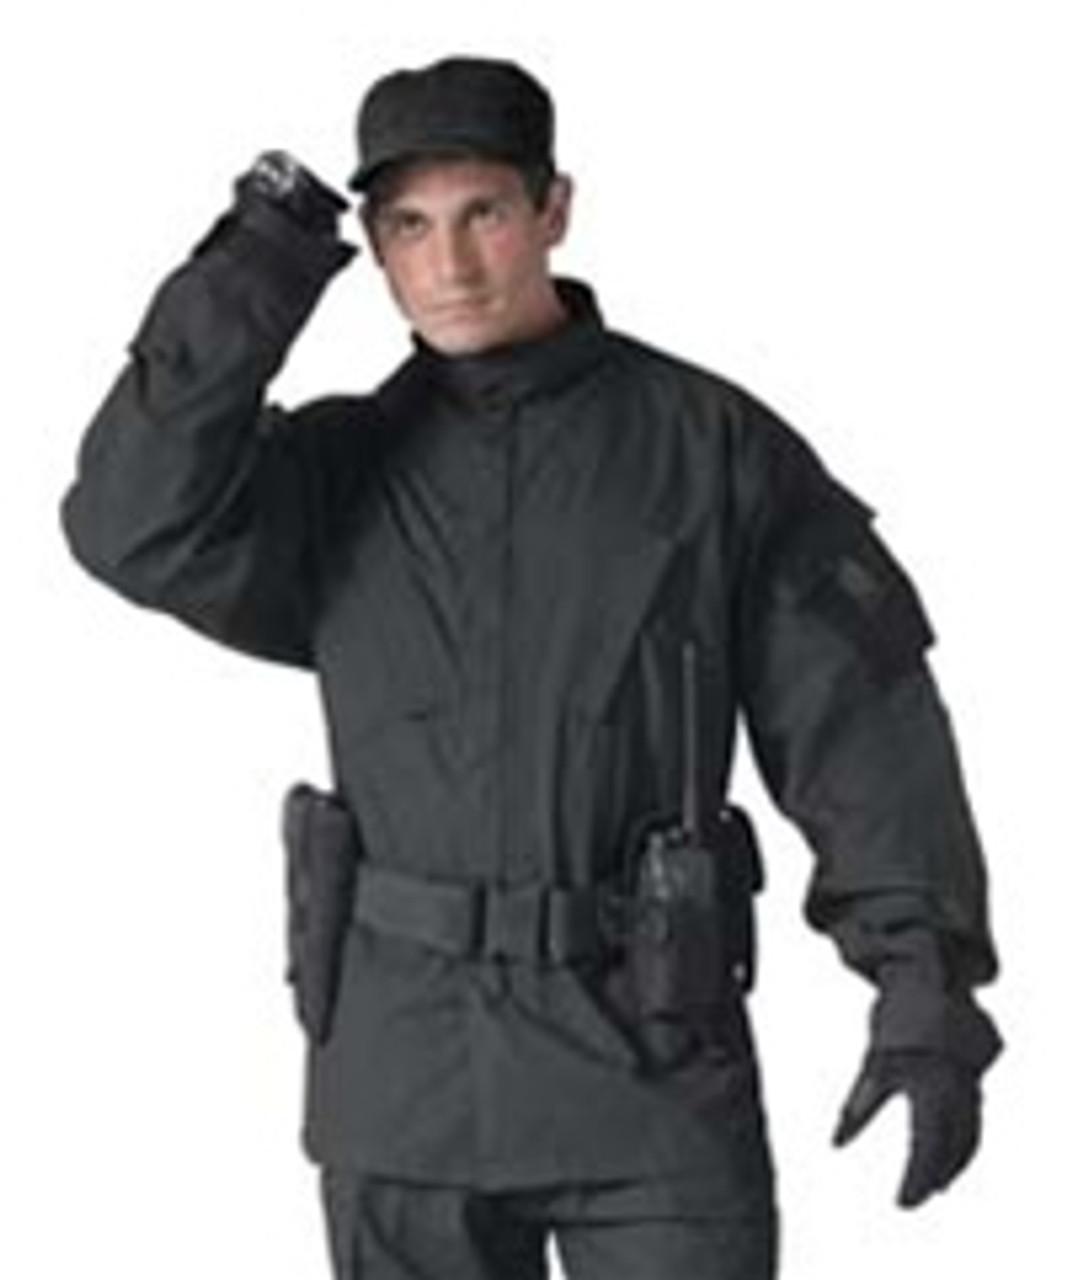 Black ACU Shirt from Hessen Tactical